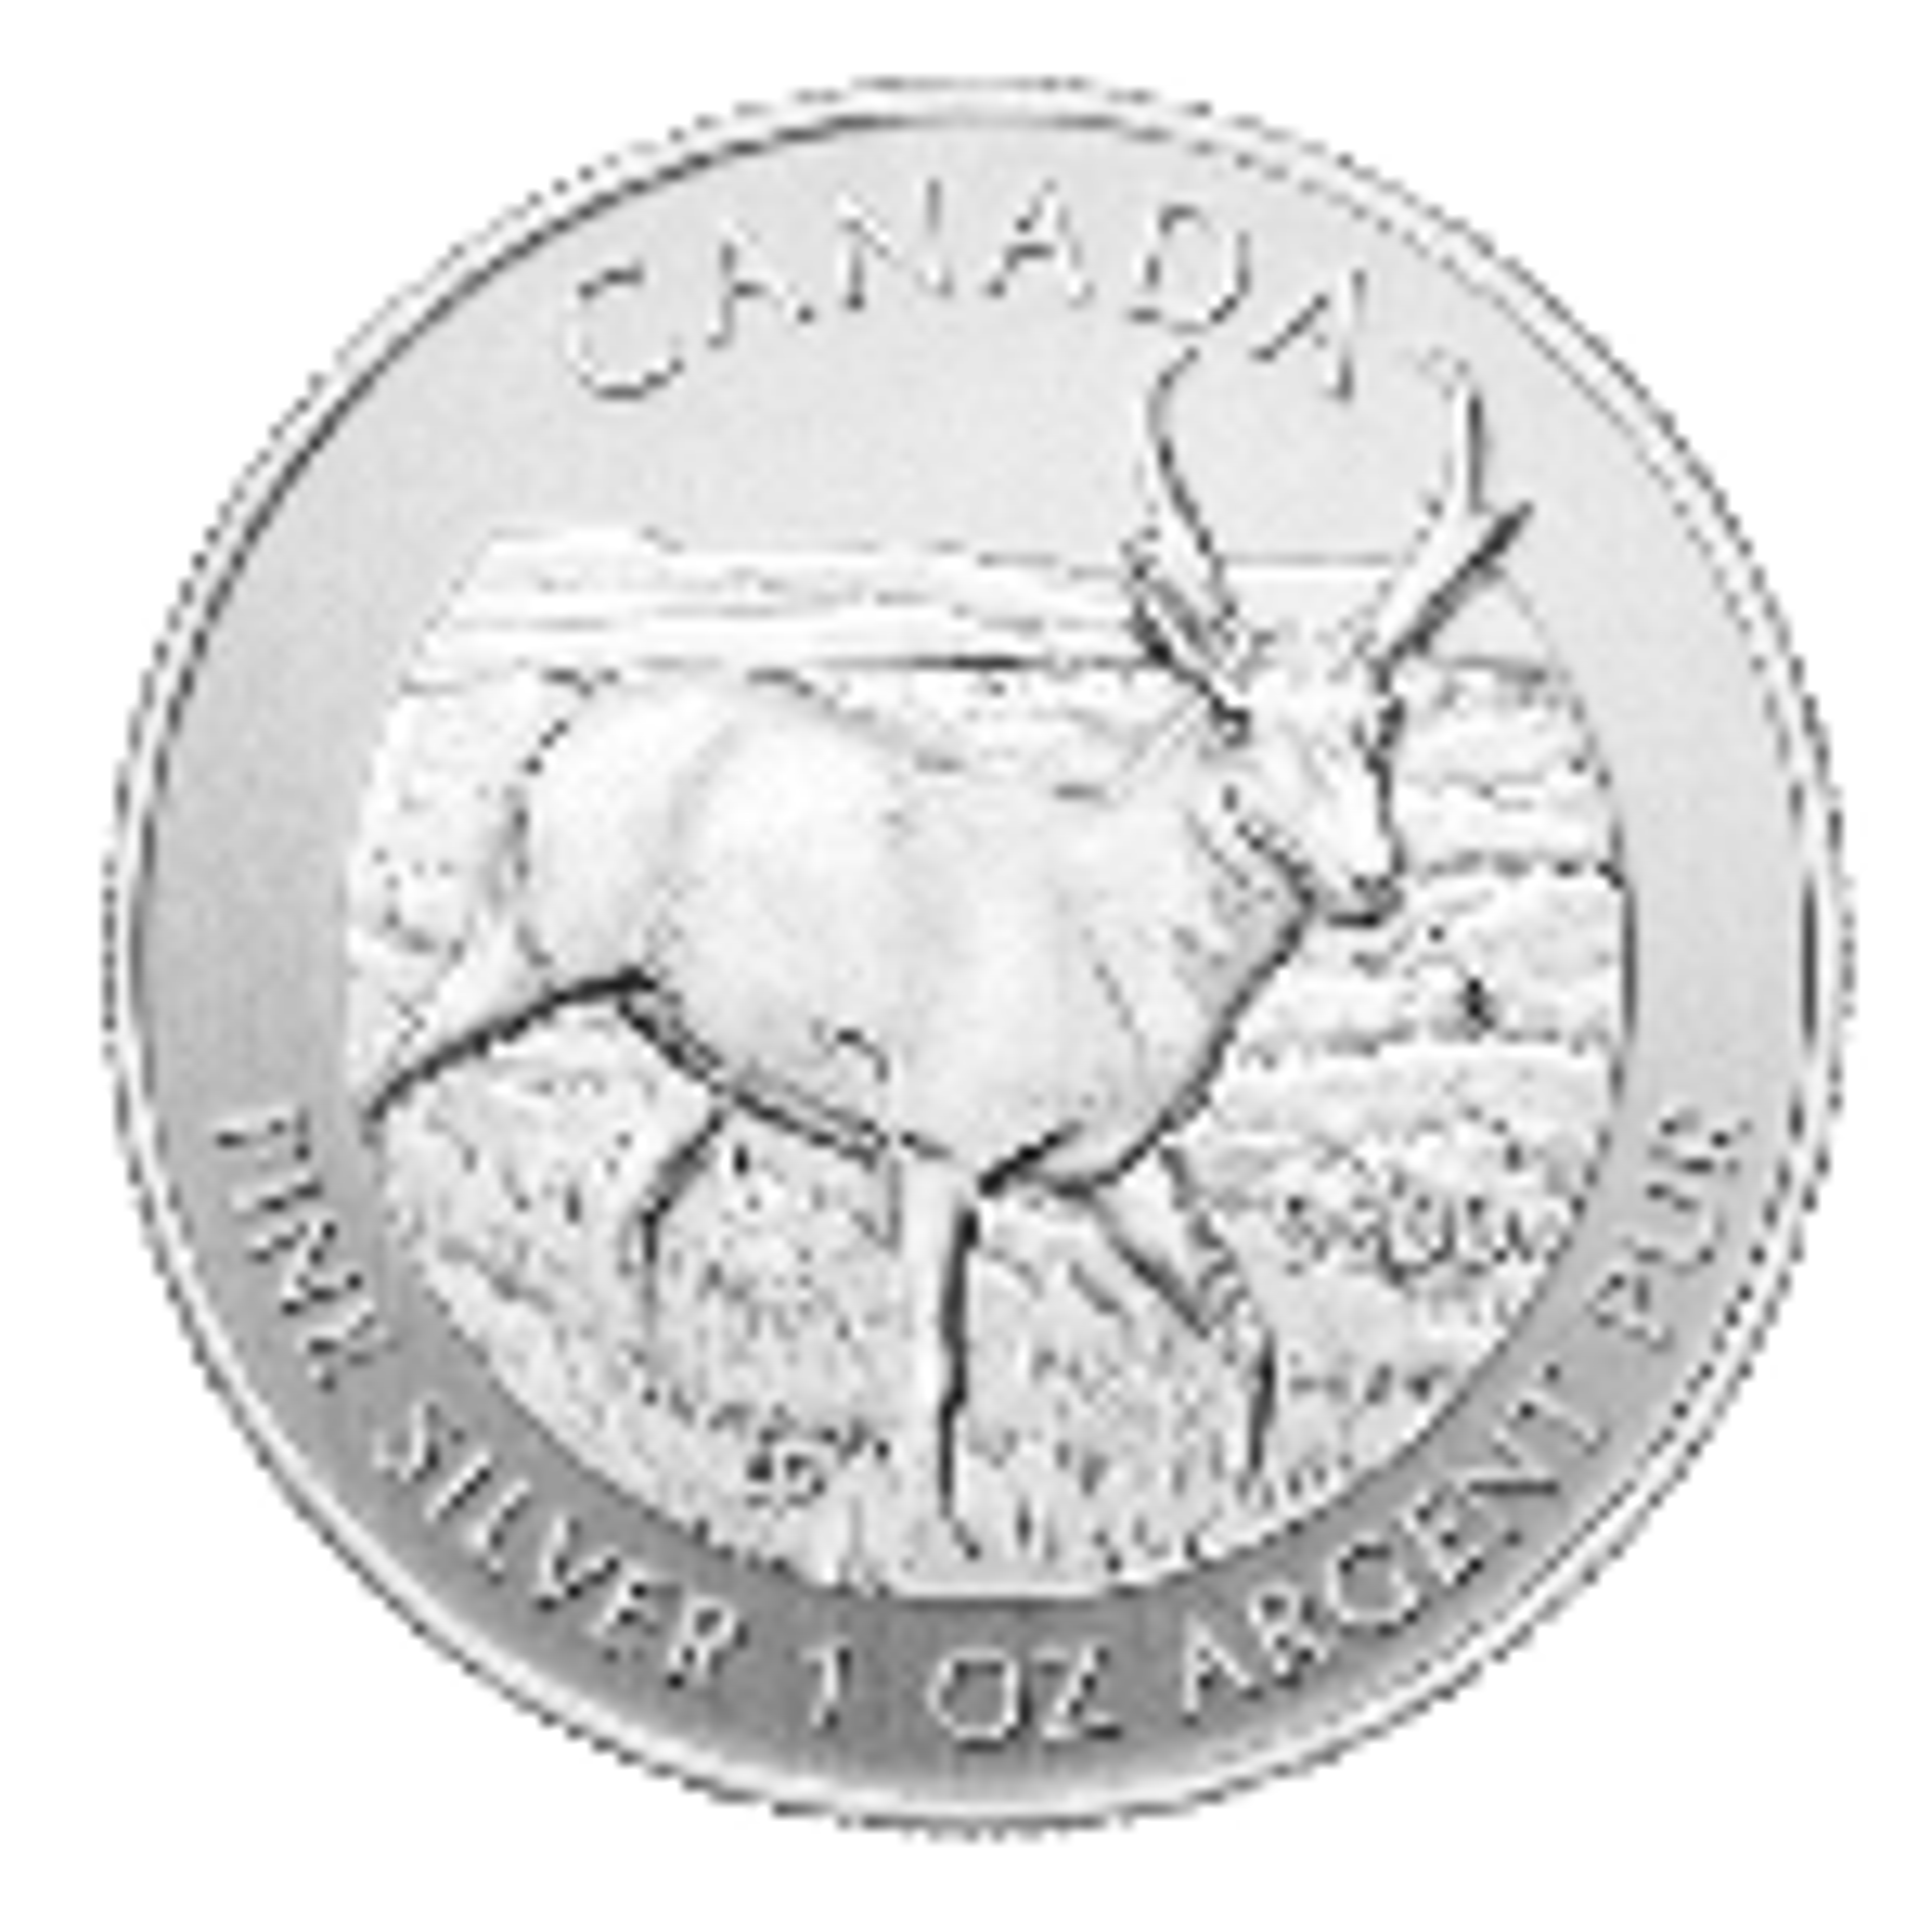 1 troy ounce zilver Maple Leaf Antilope 2013